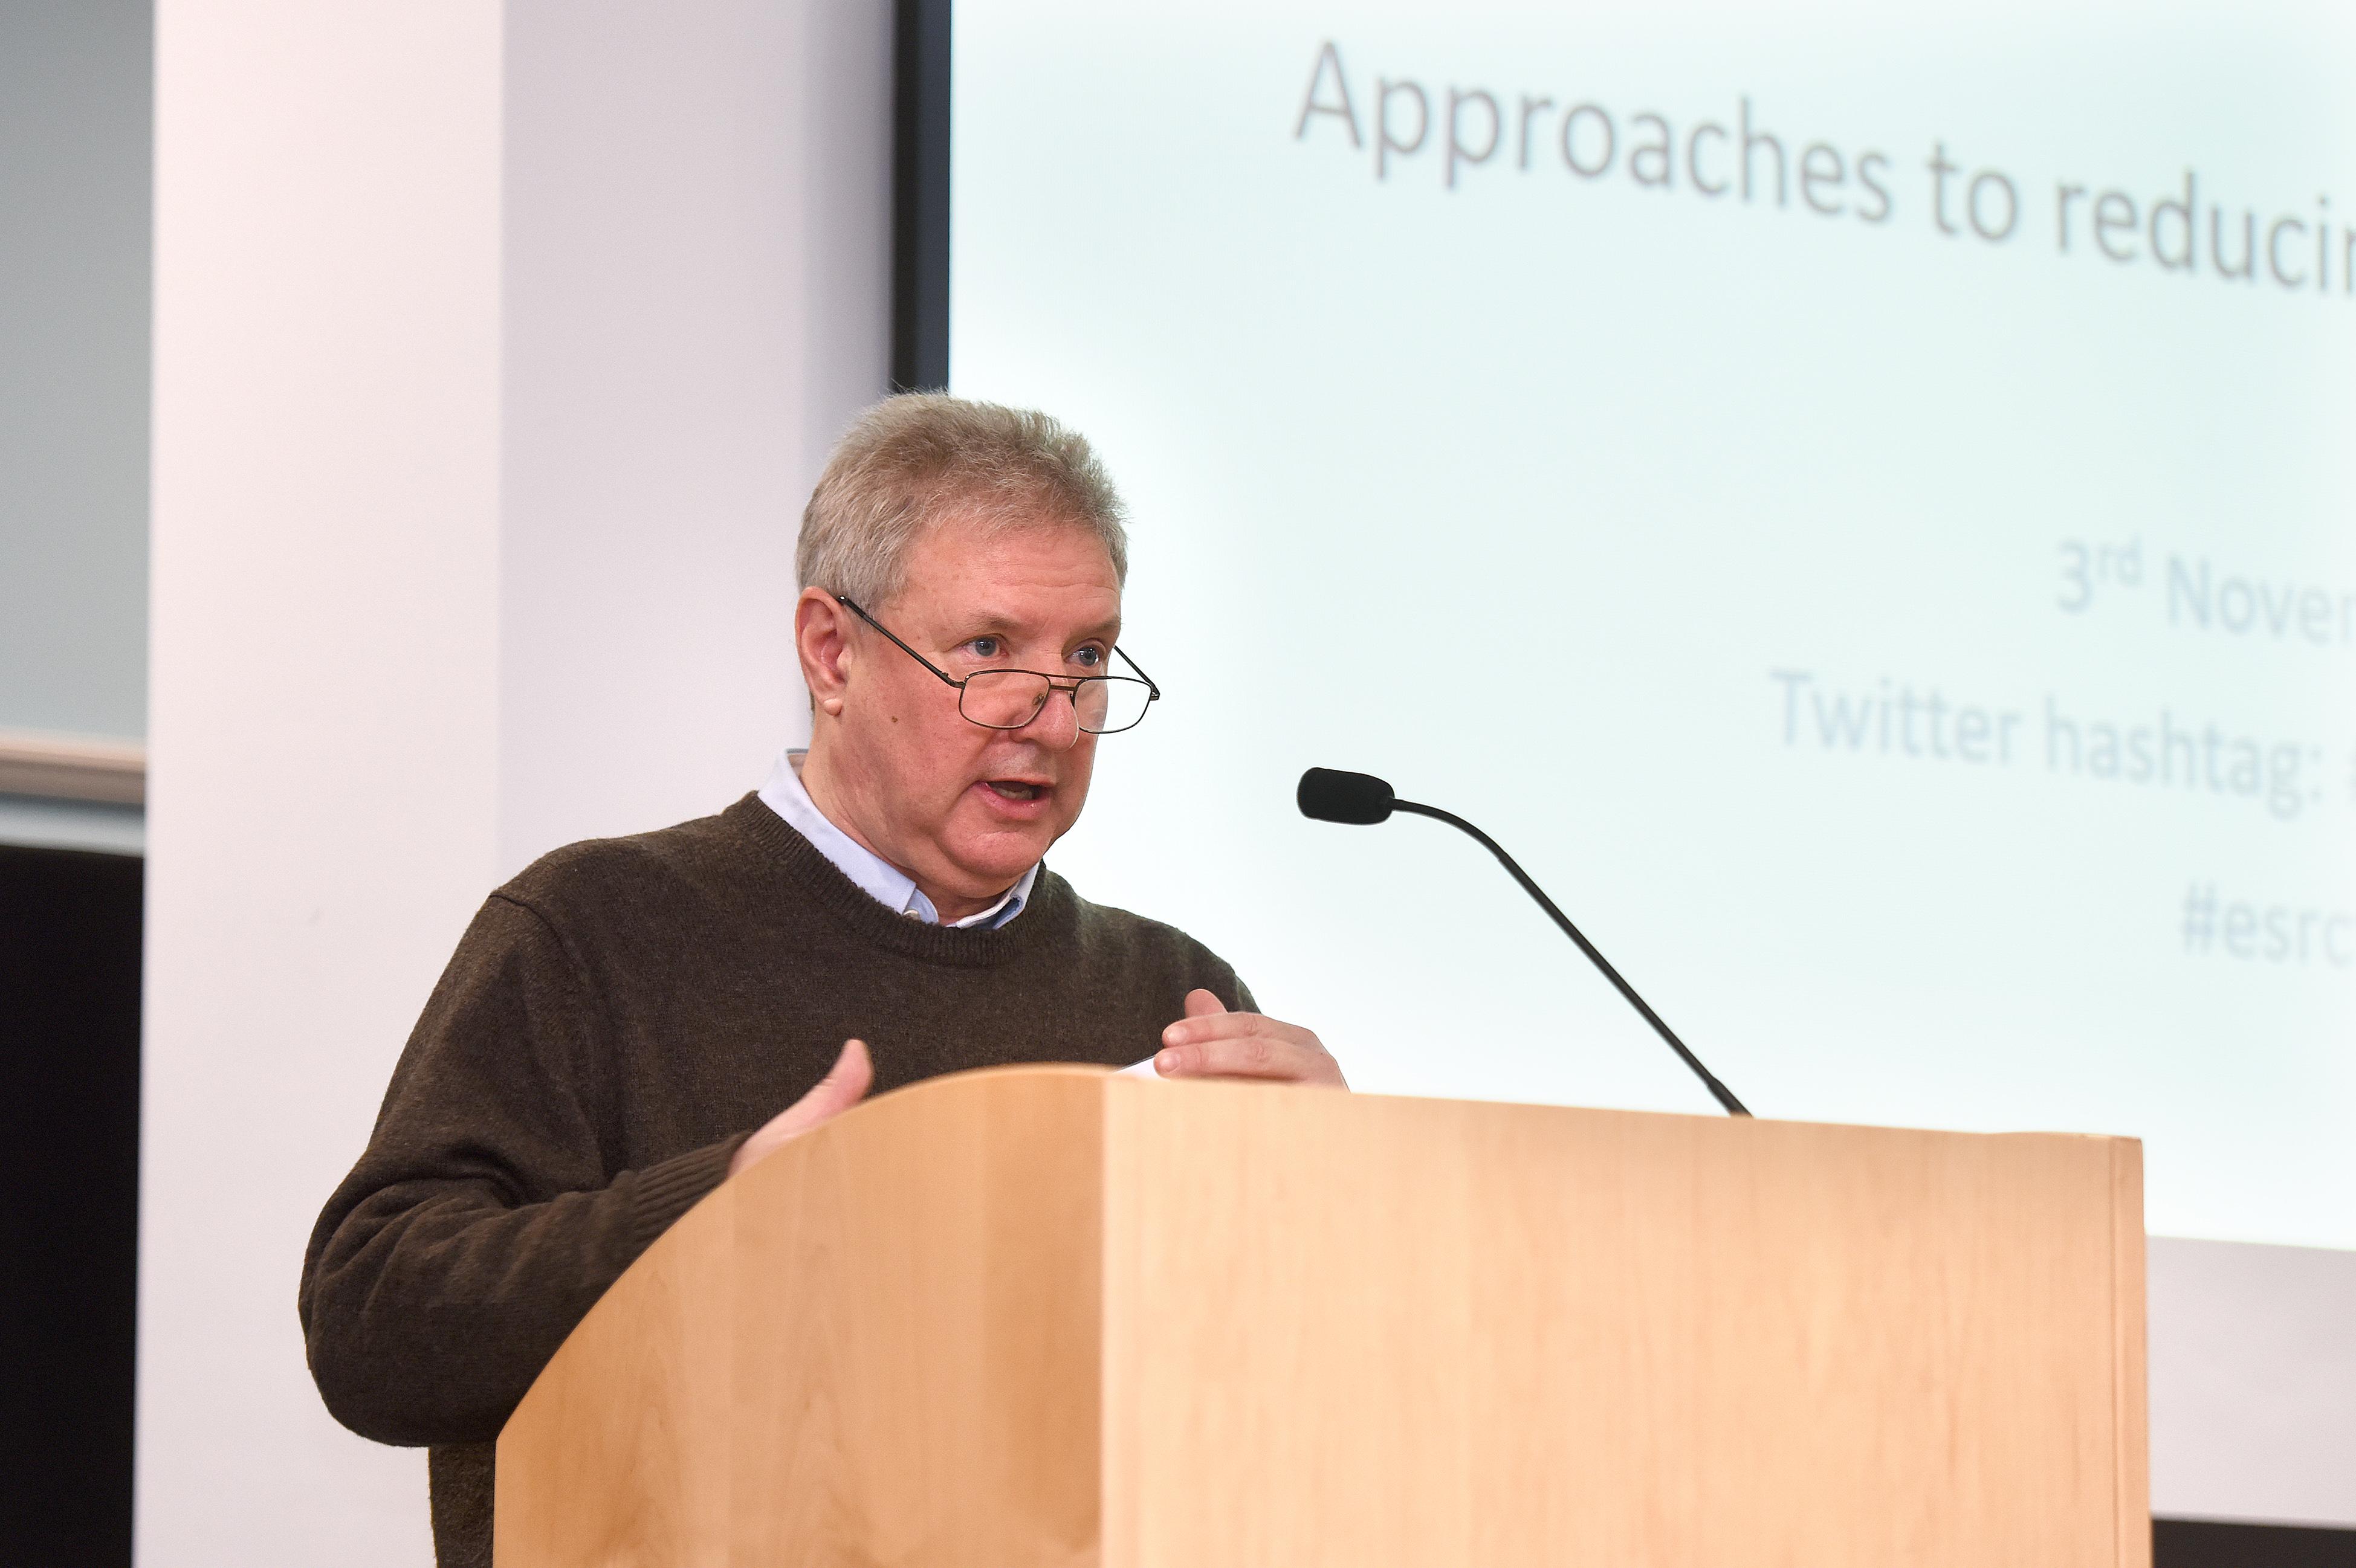 Professor Nigel South